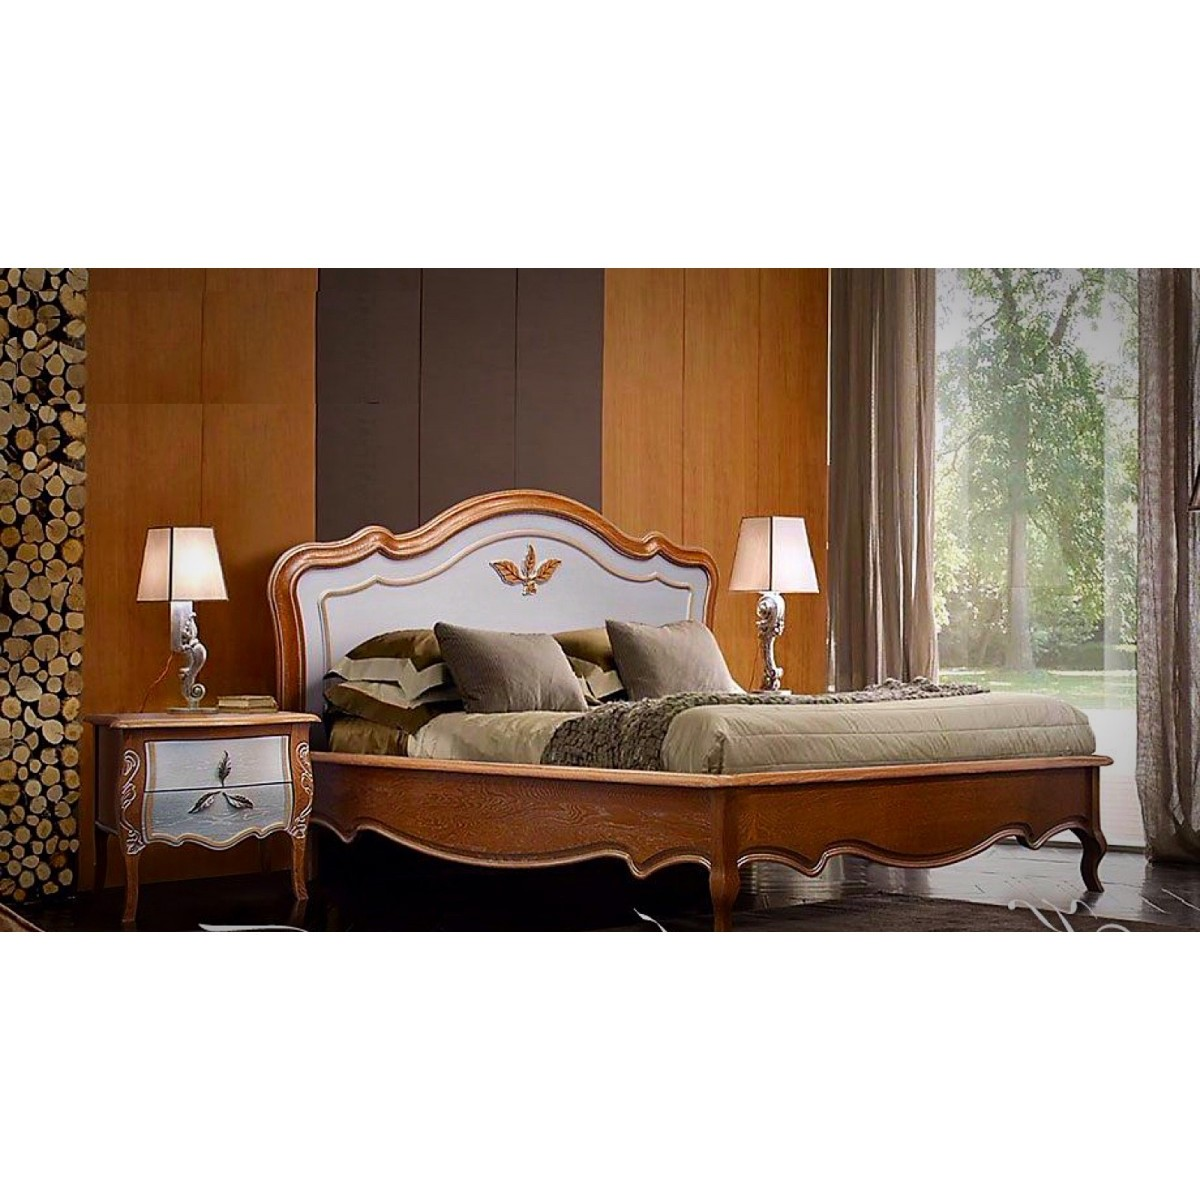 Full Size of Bett Antik Antikes Teresa 210cm Eichenholz Massiv Farbe Gognac Mit Bonprix Betten Weiss 2m X Stauraum 160x200 Landhaus Designer Modernes 180x200 Eiche Bett Bett Antik